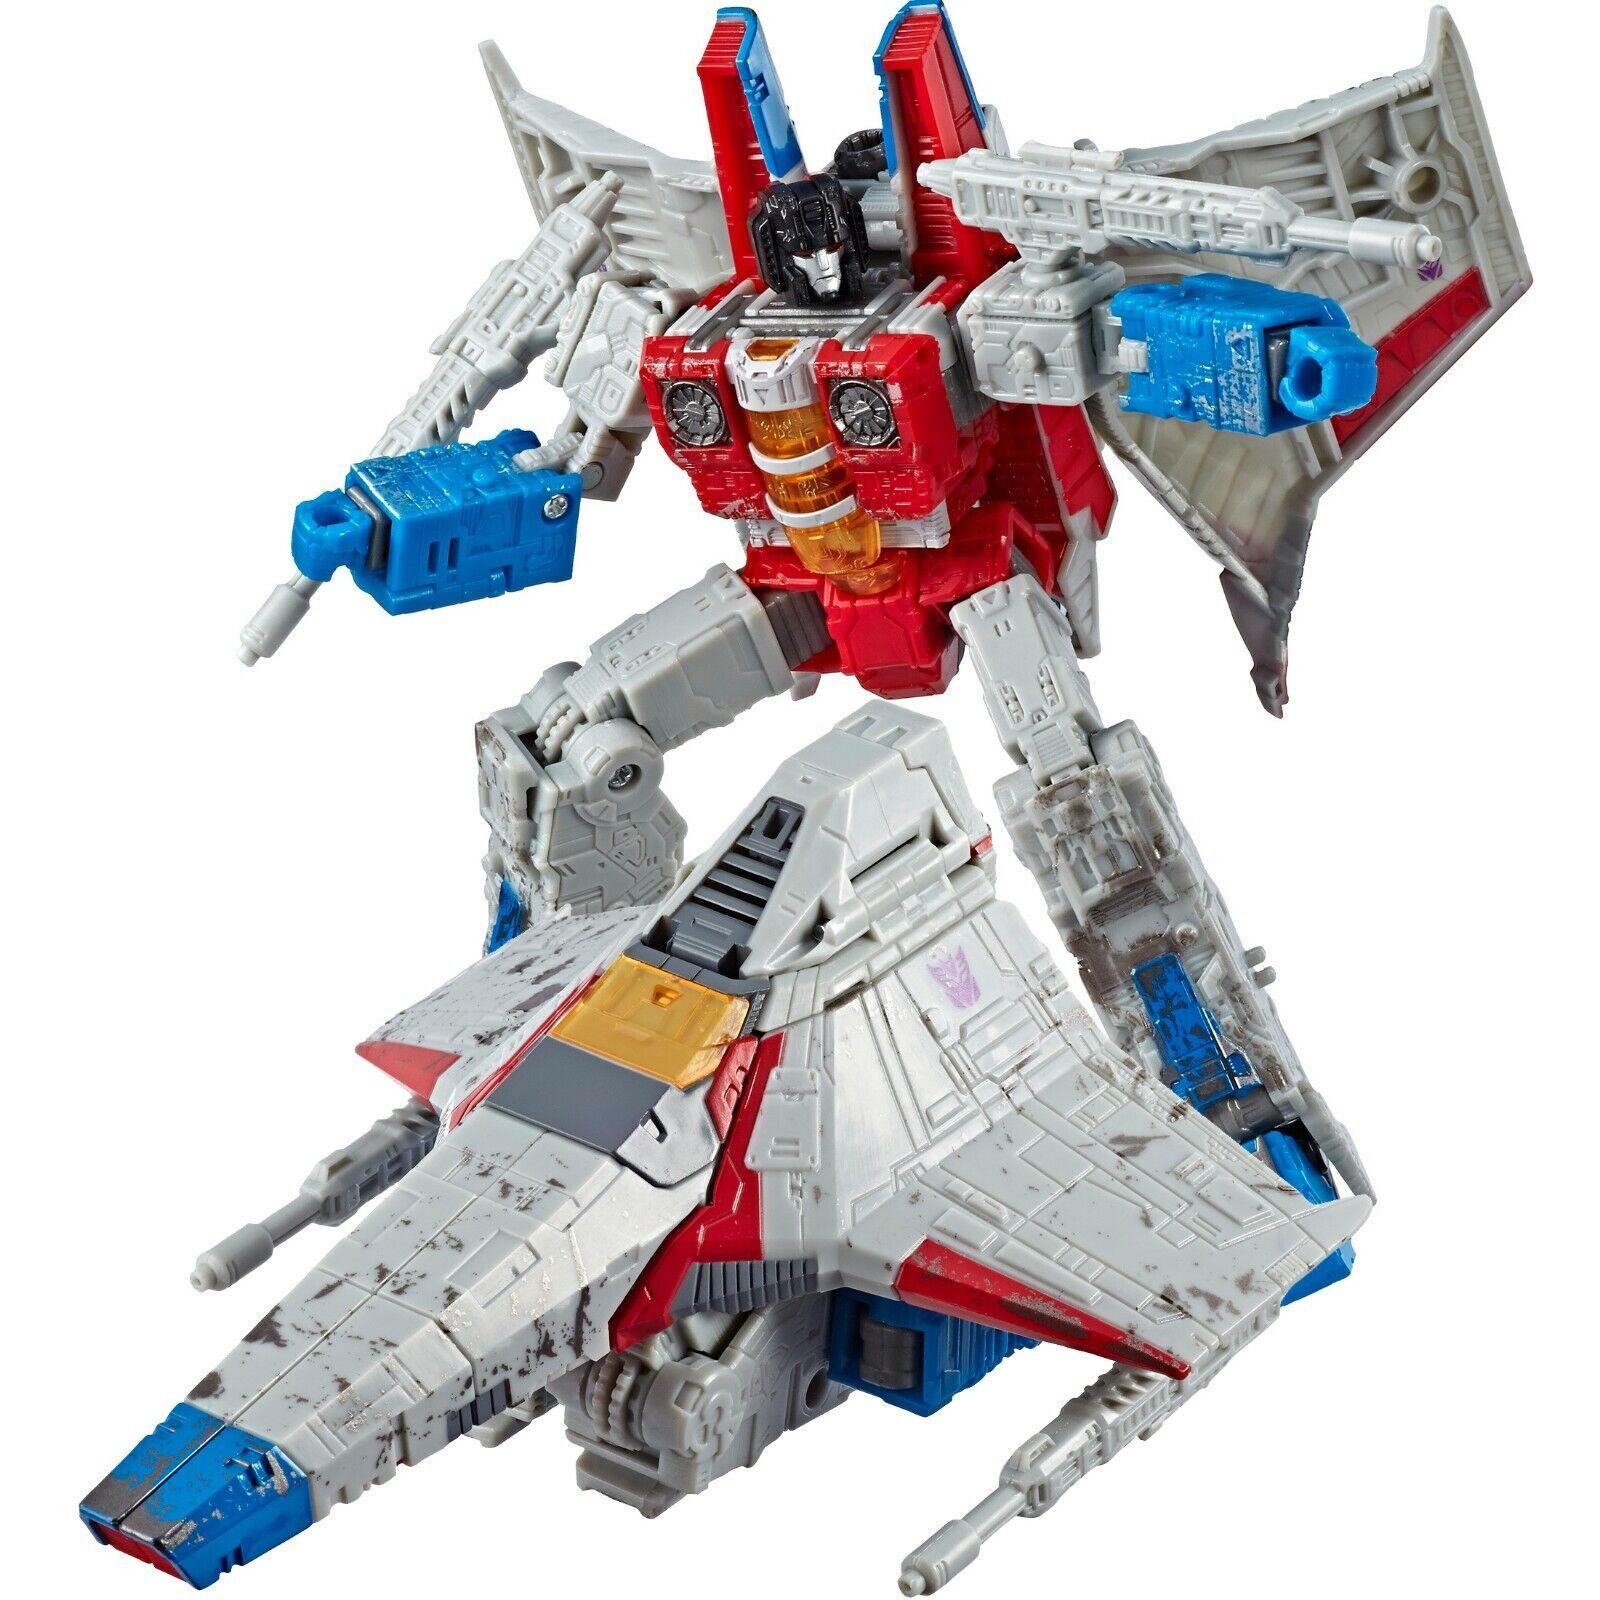 Transformers SIEGE WFC War Cybertron W2 W2 W2 Voyager Soundwave & Starscream Set New e03e6f